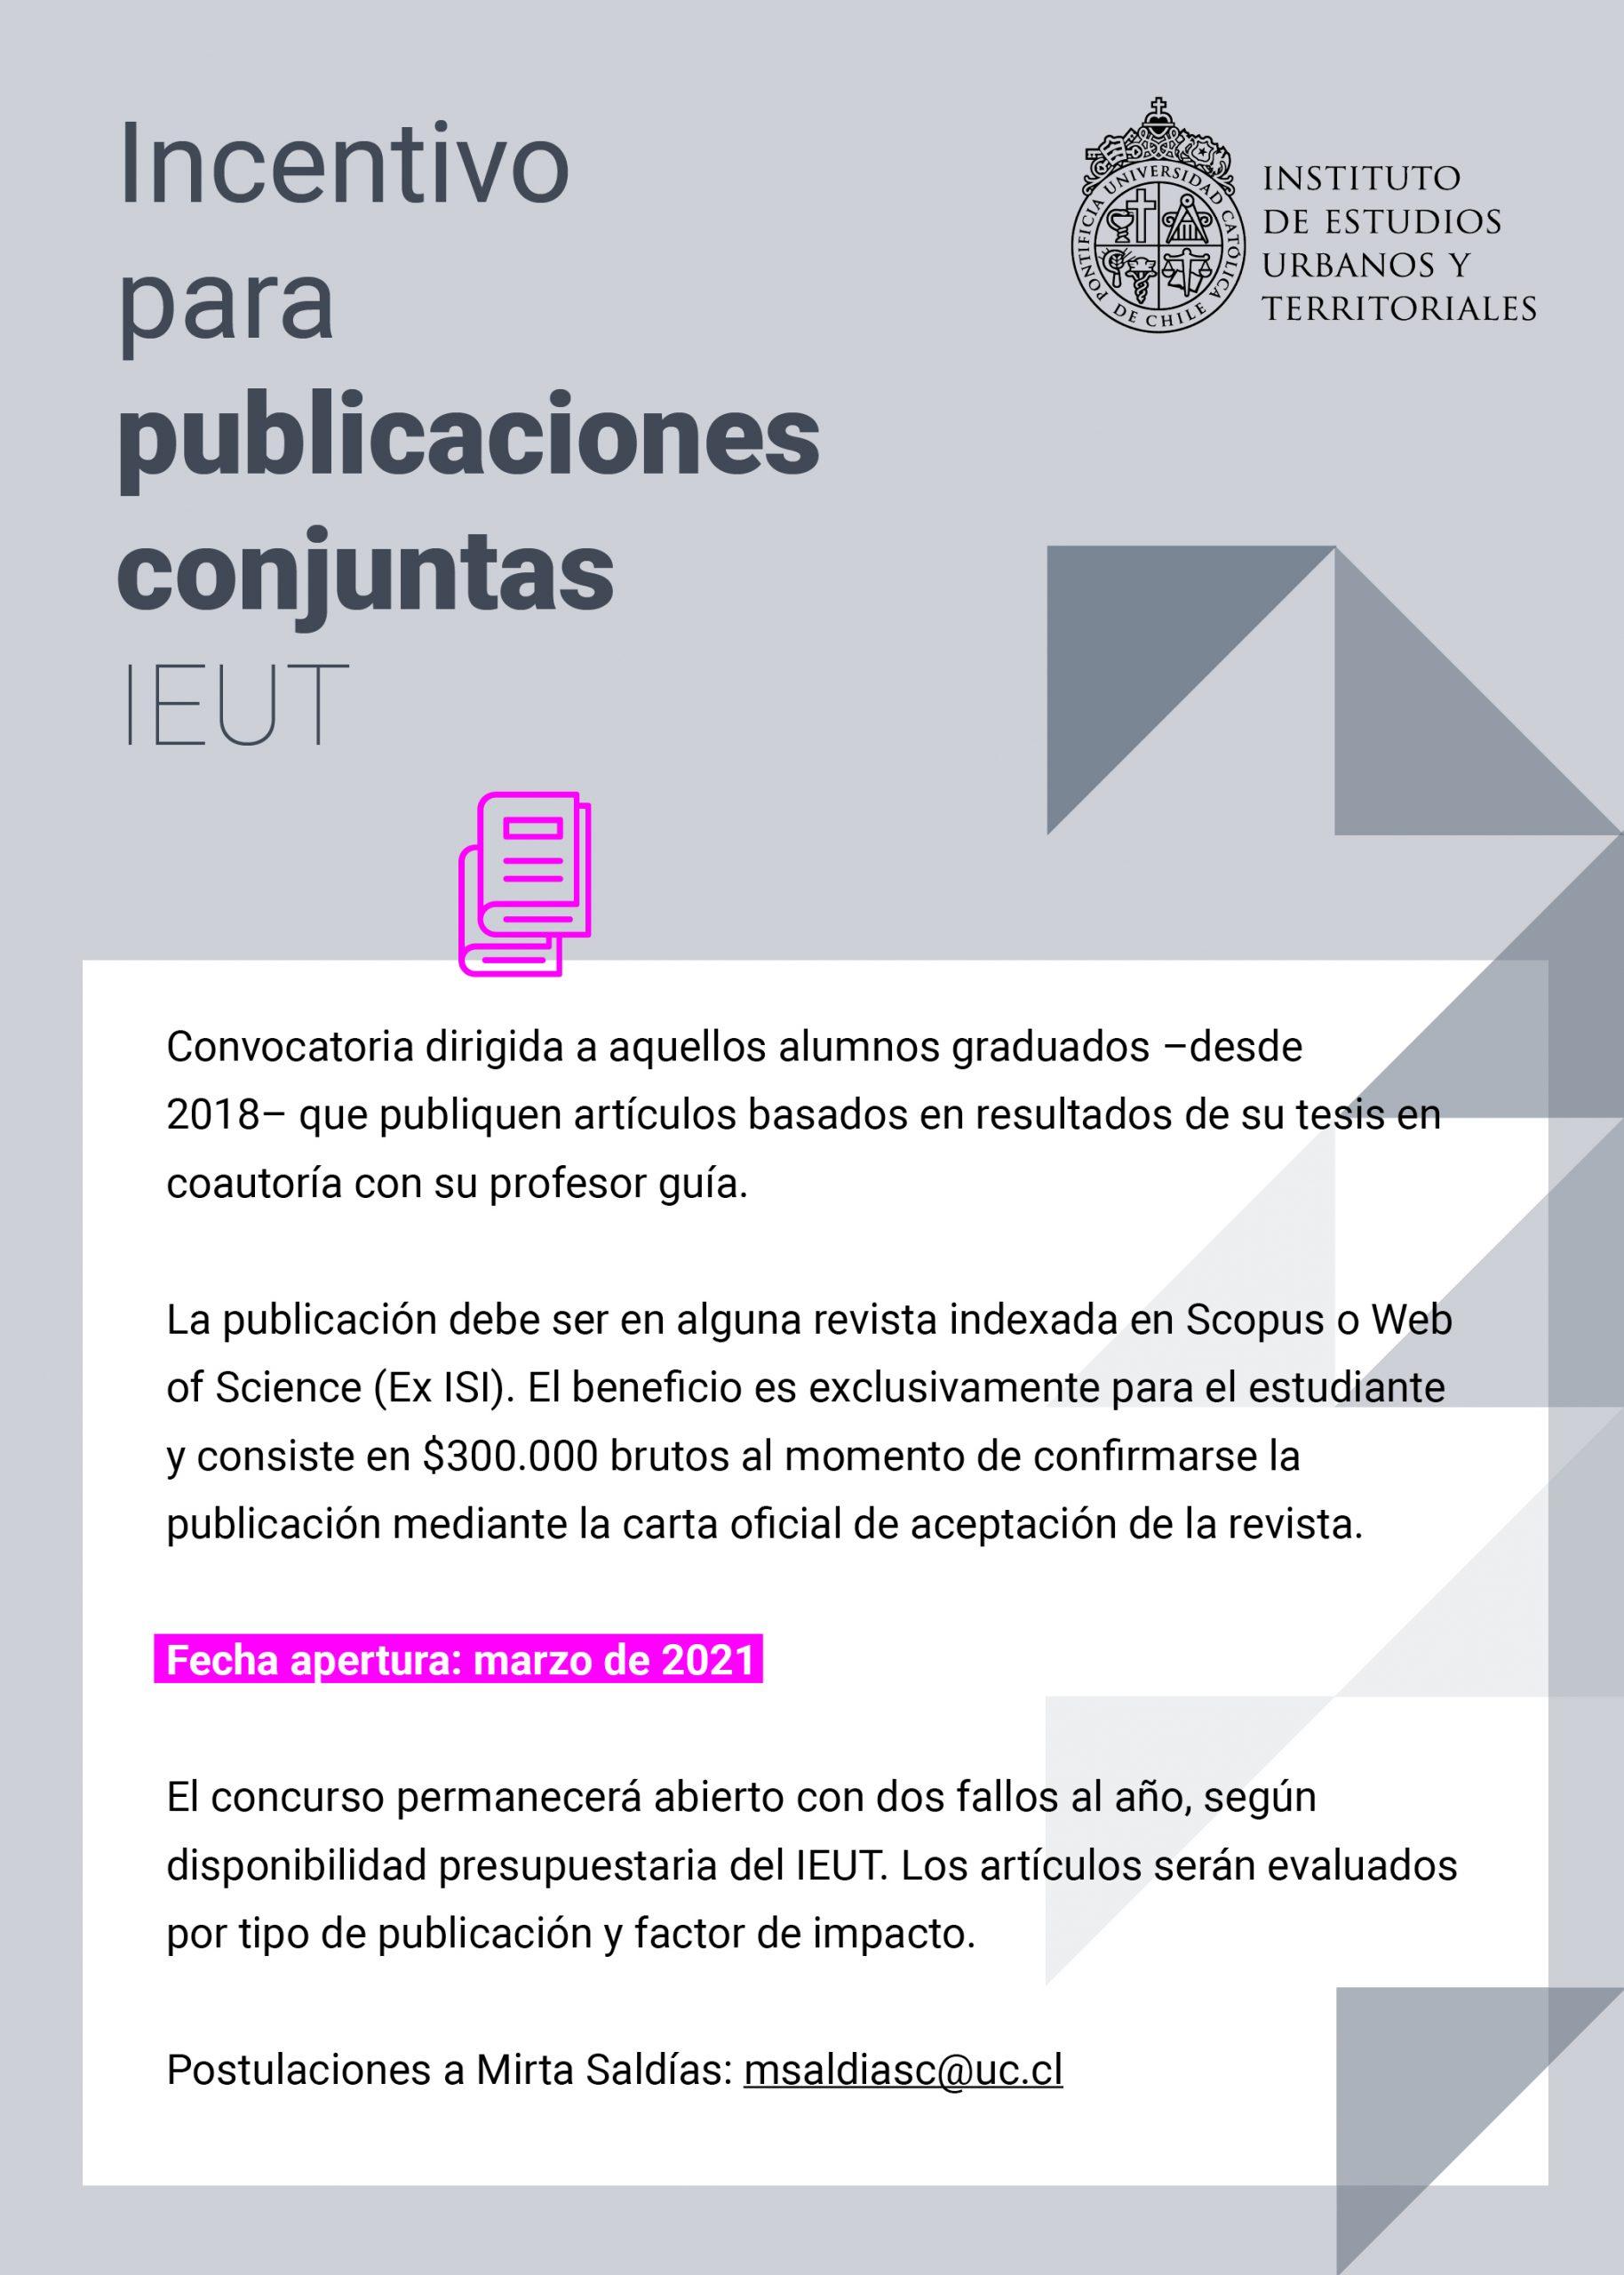 CONVOCATORIA | Incentivo para publicaciones conjuntas IEUT